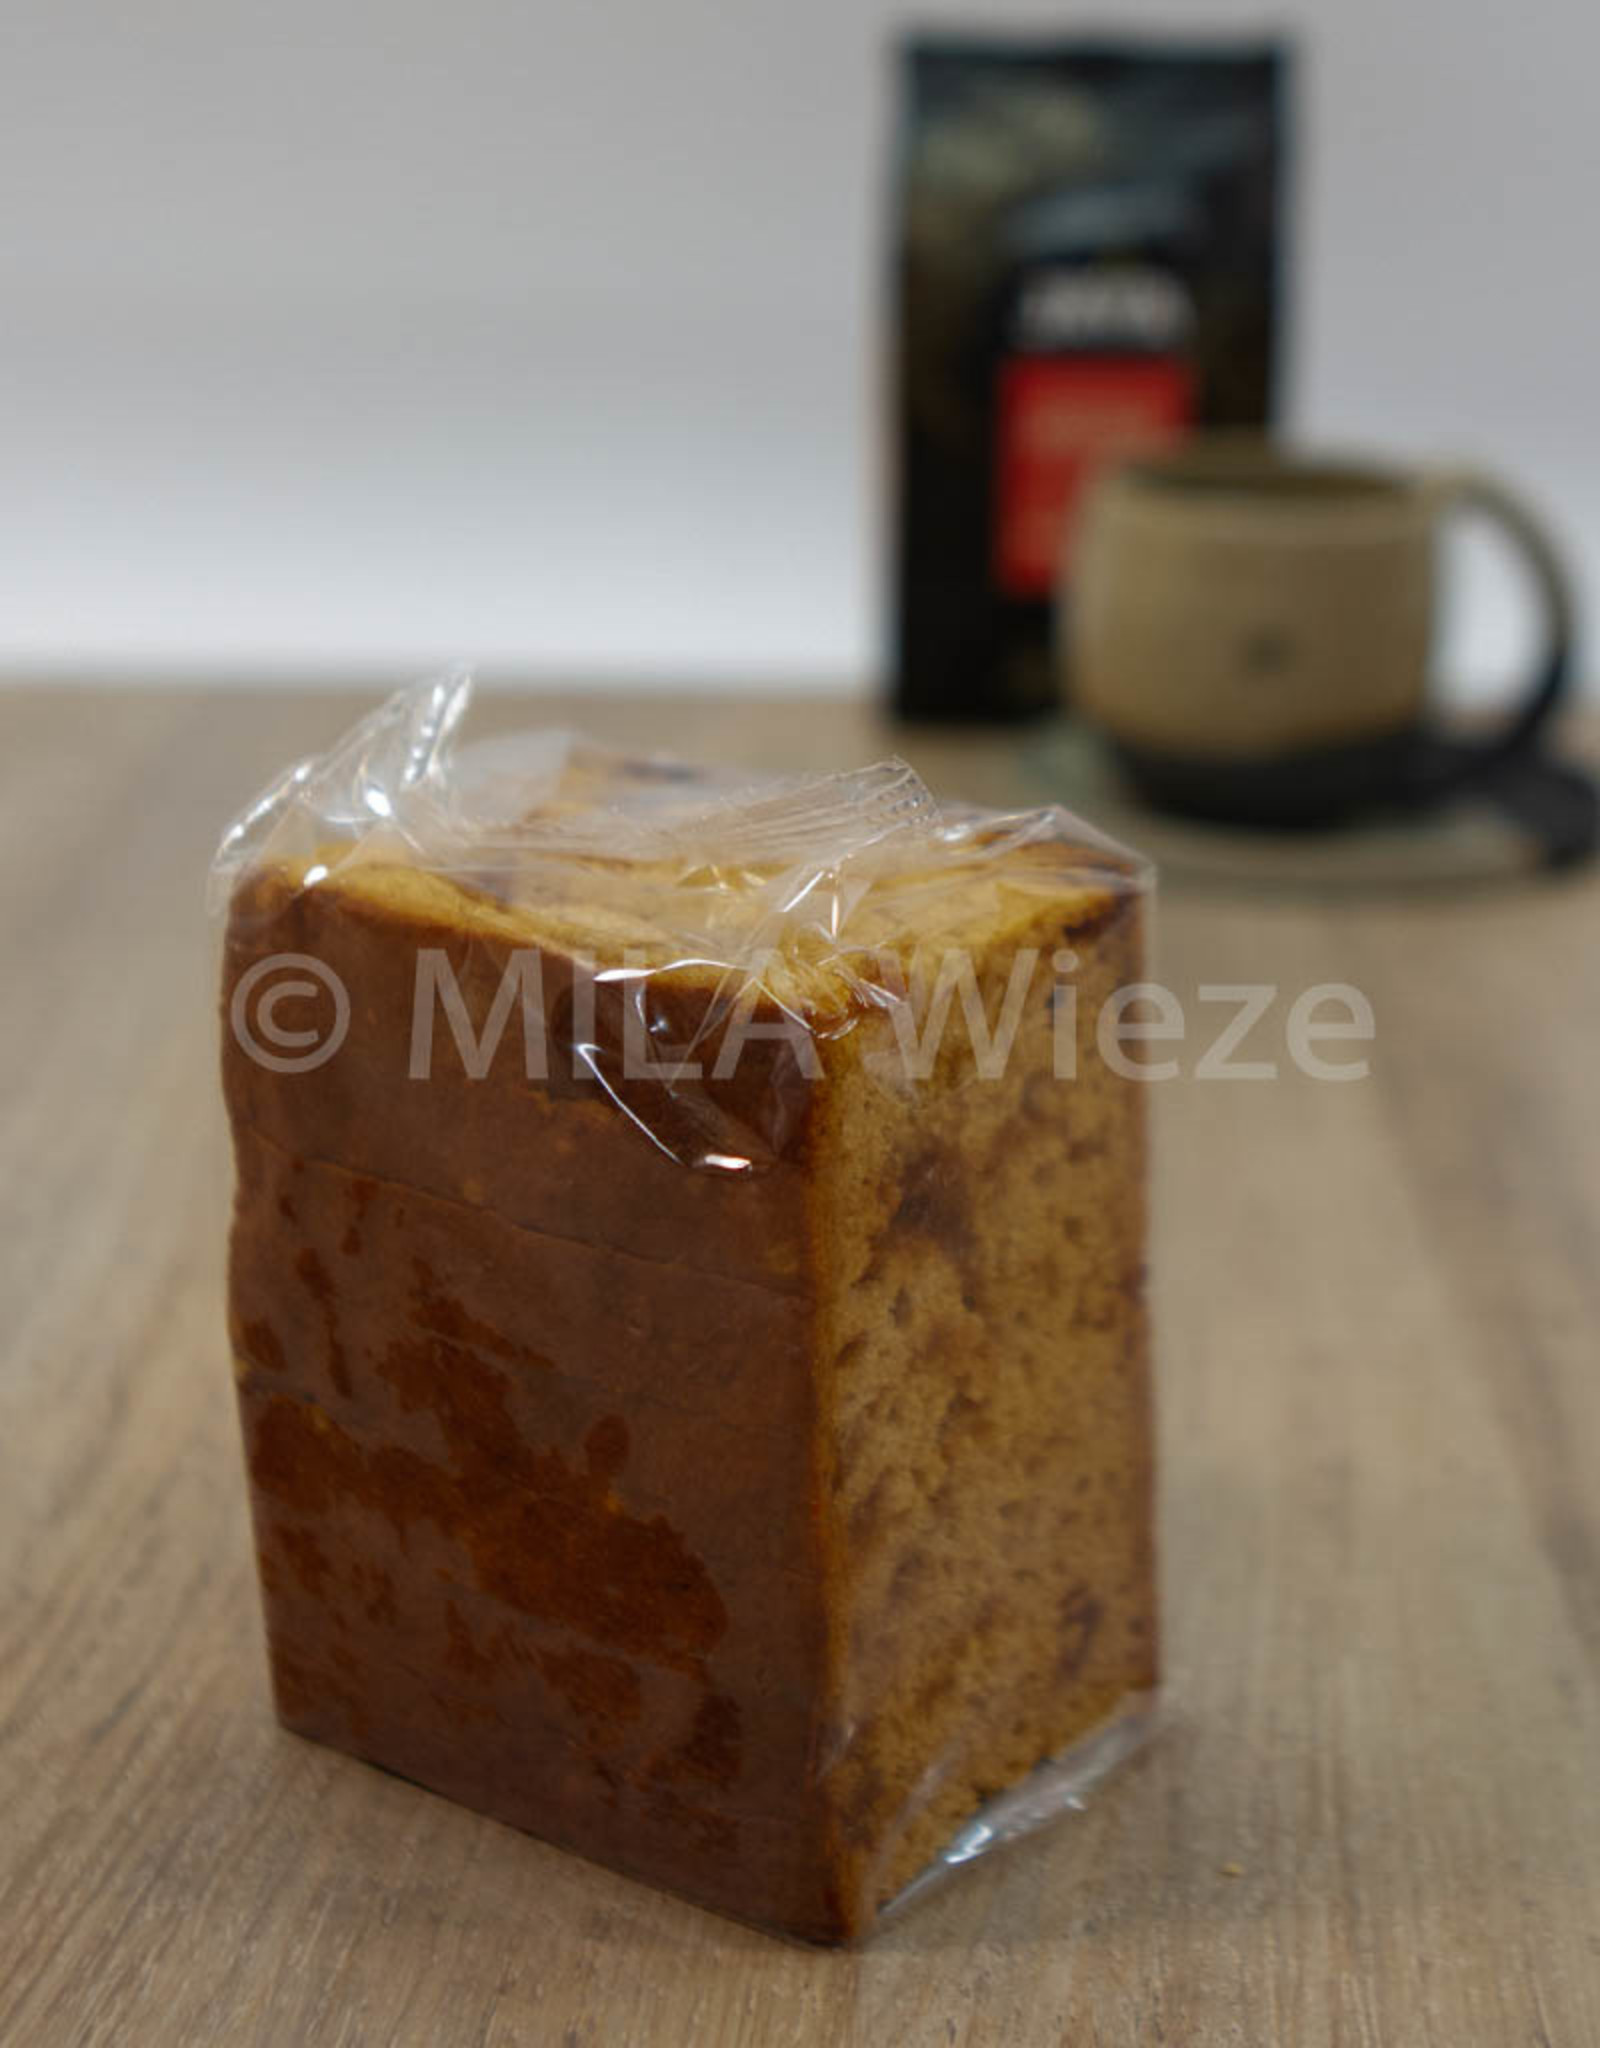 Ambachtelijk gebakken peperkoek caramel/zeezout - 220 gr